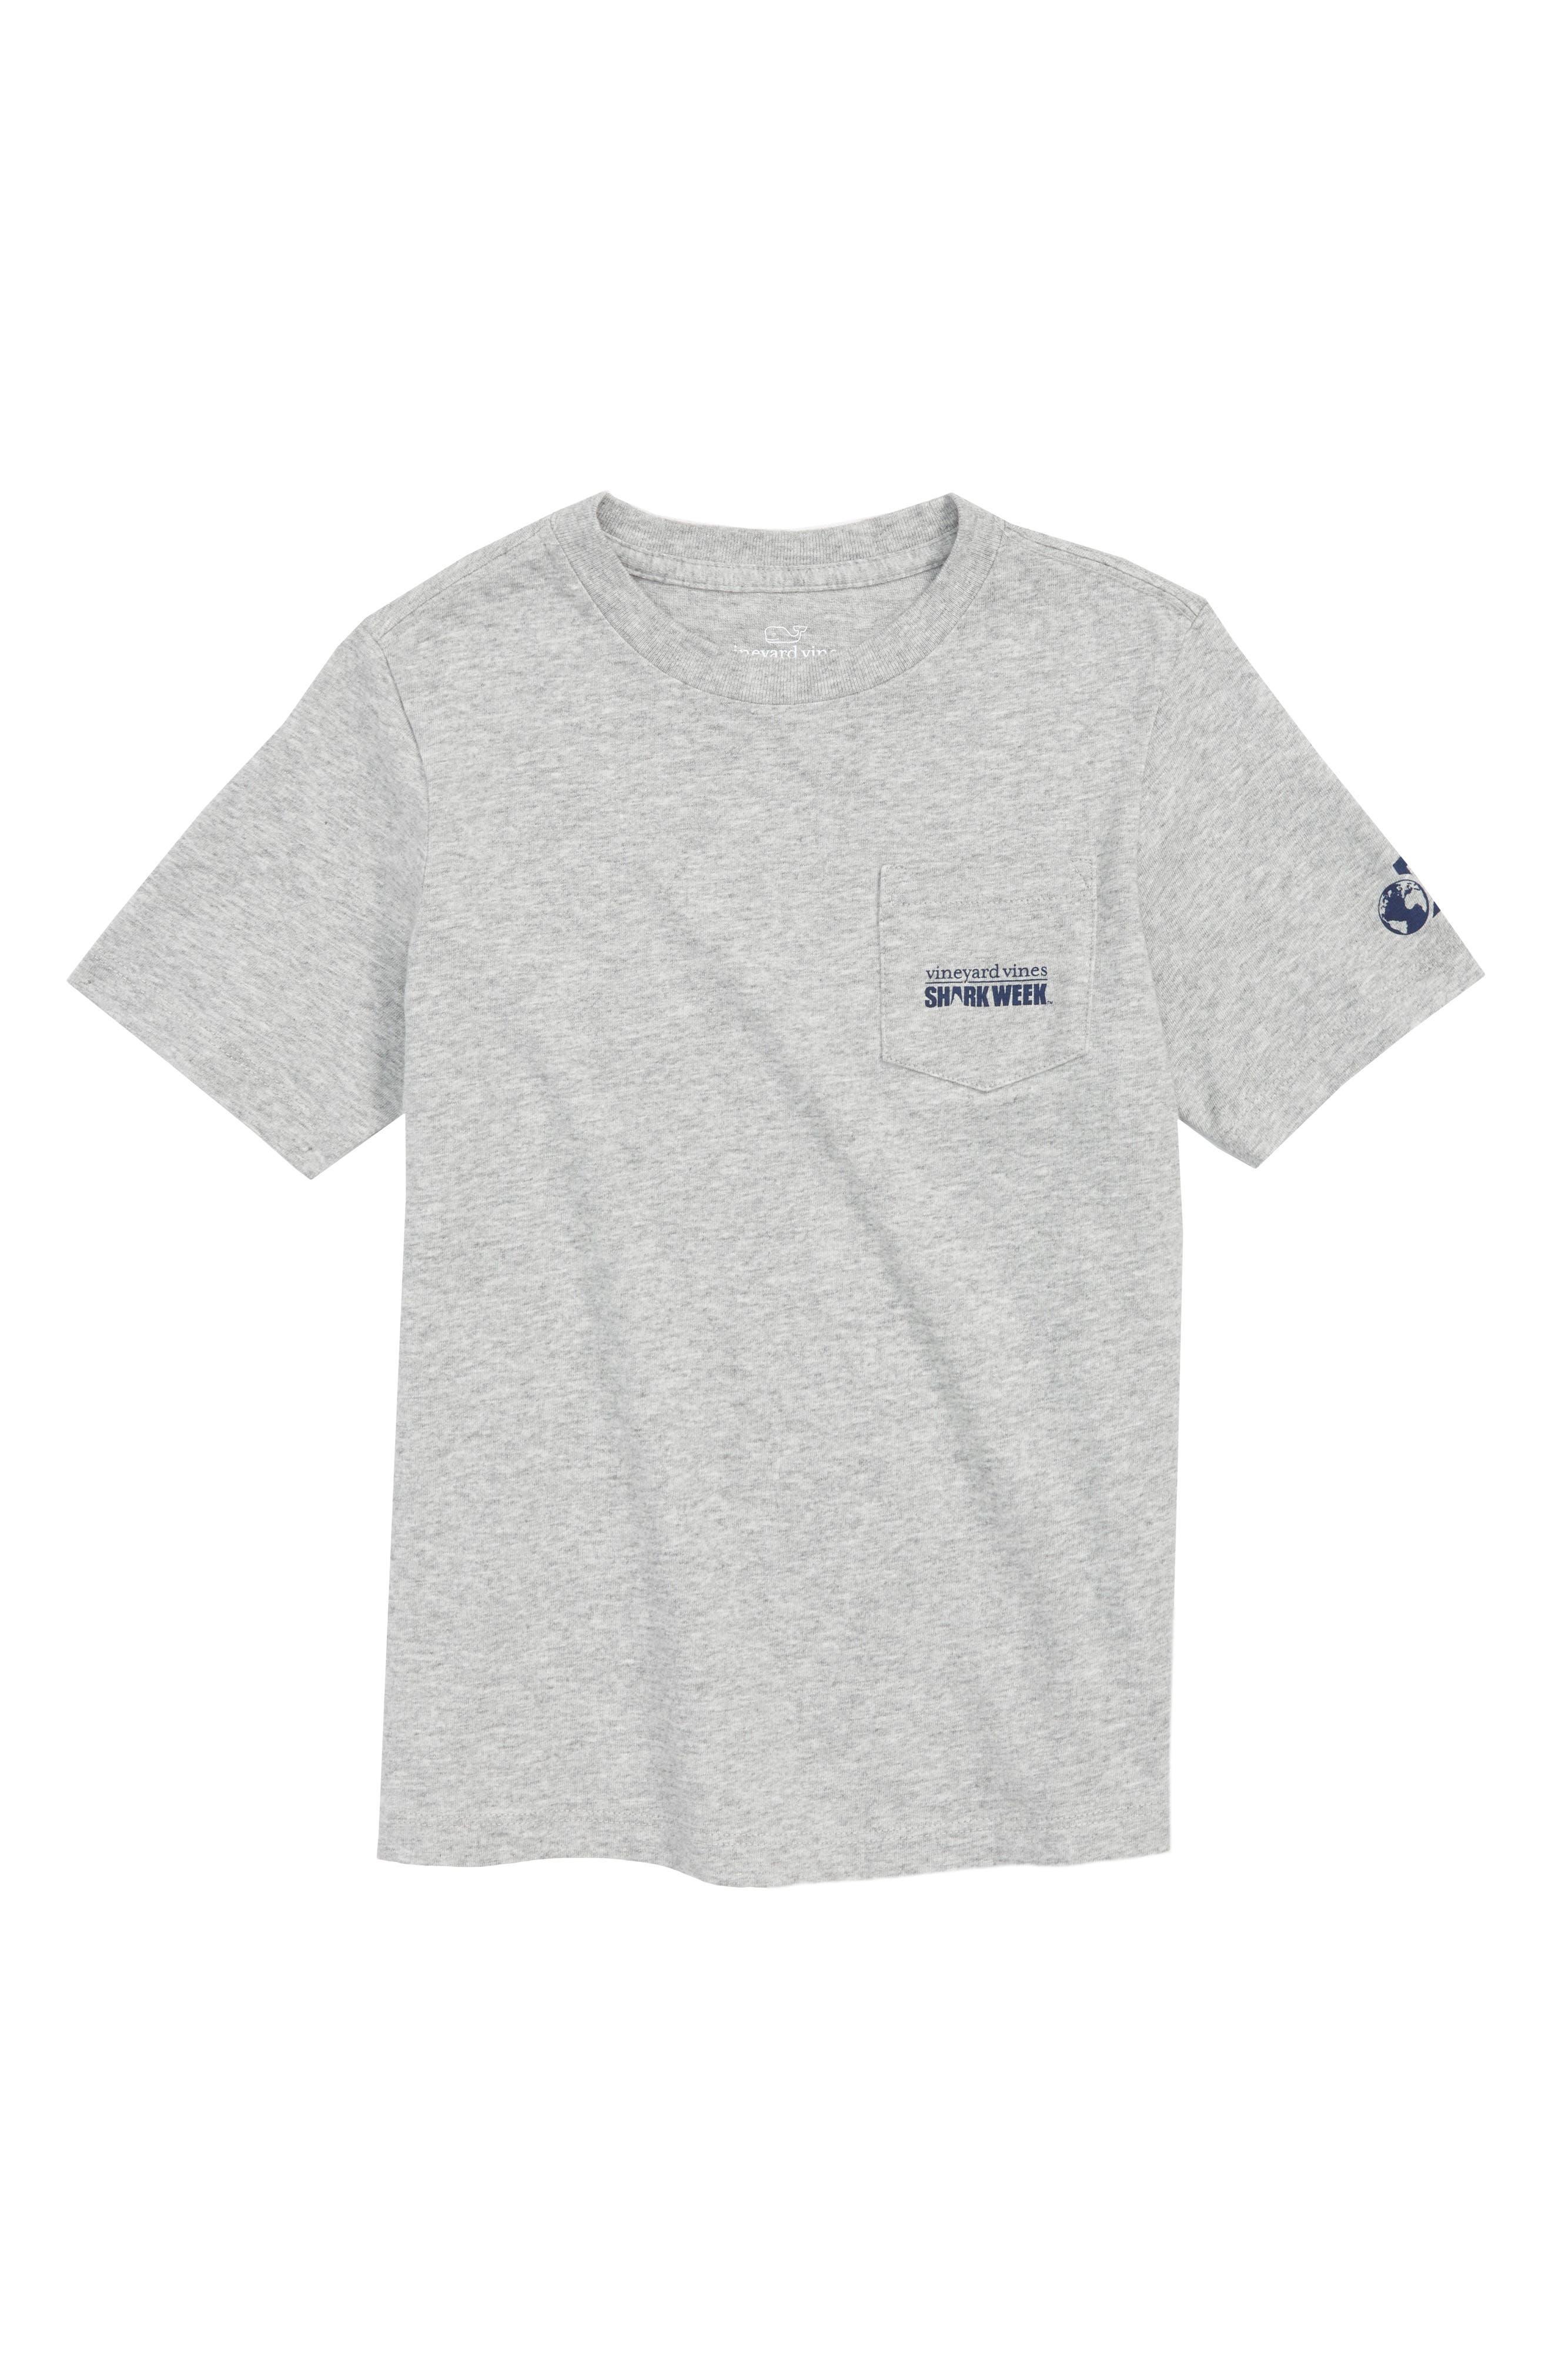 x Shark Week<sup>™</sup> Sharks & Stripes Pocket T-Shirt,                         Main,                         color, GRAY HEATHER